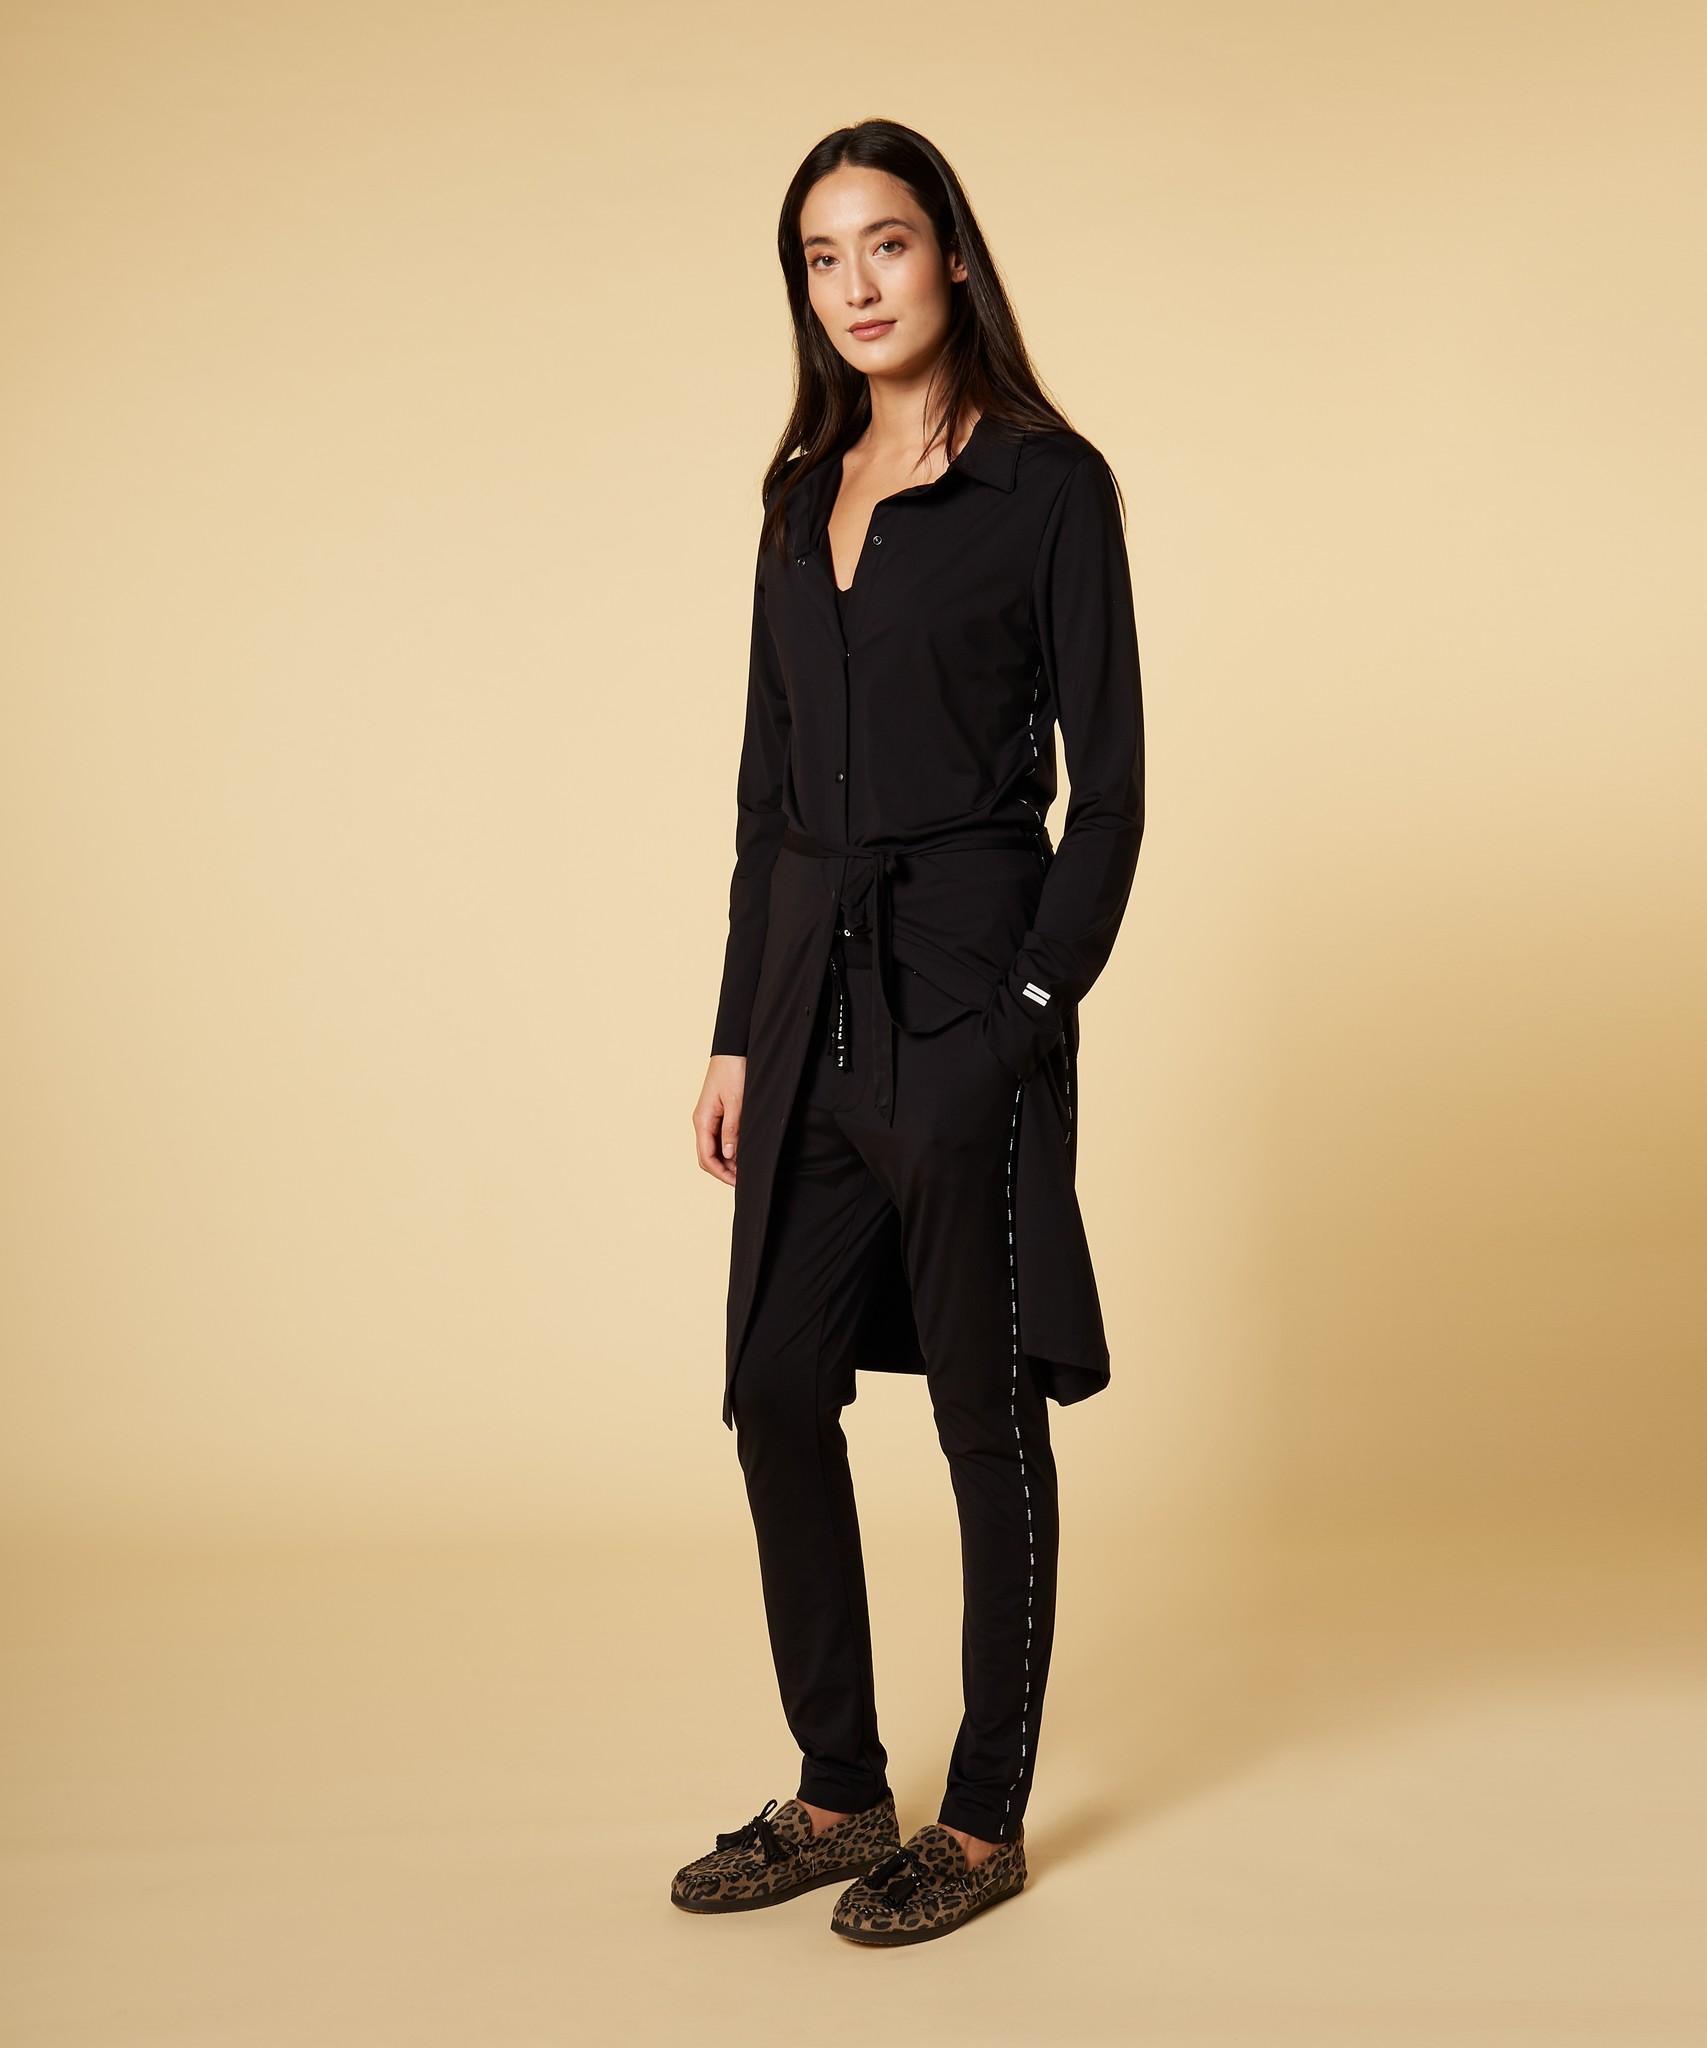 Jurk shirt dress black-3